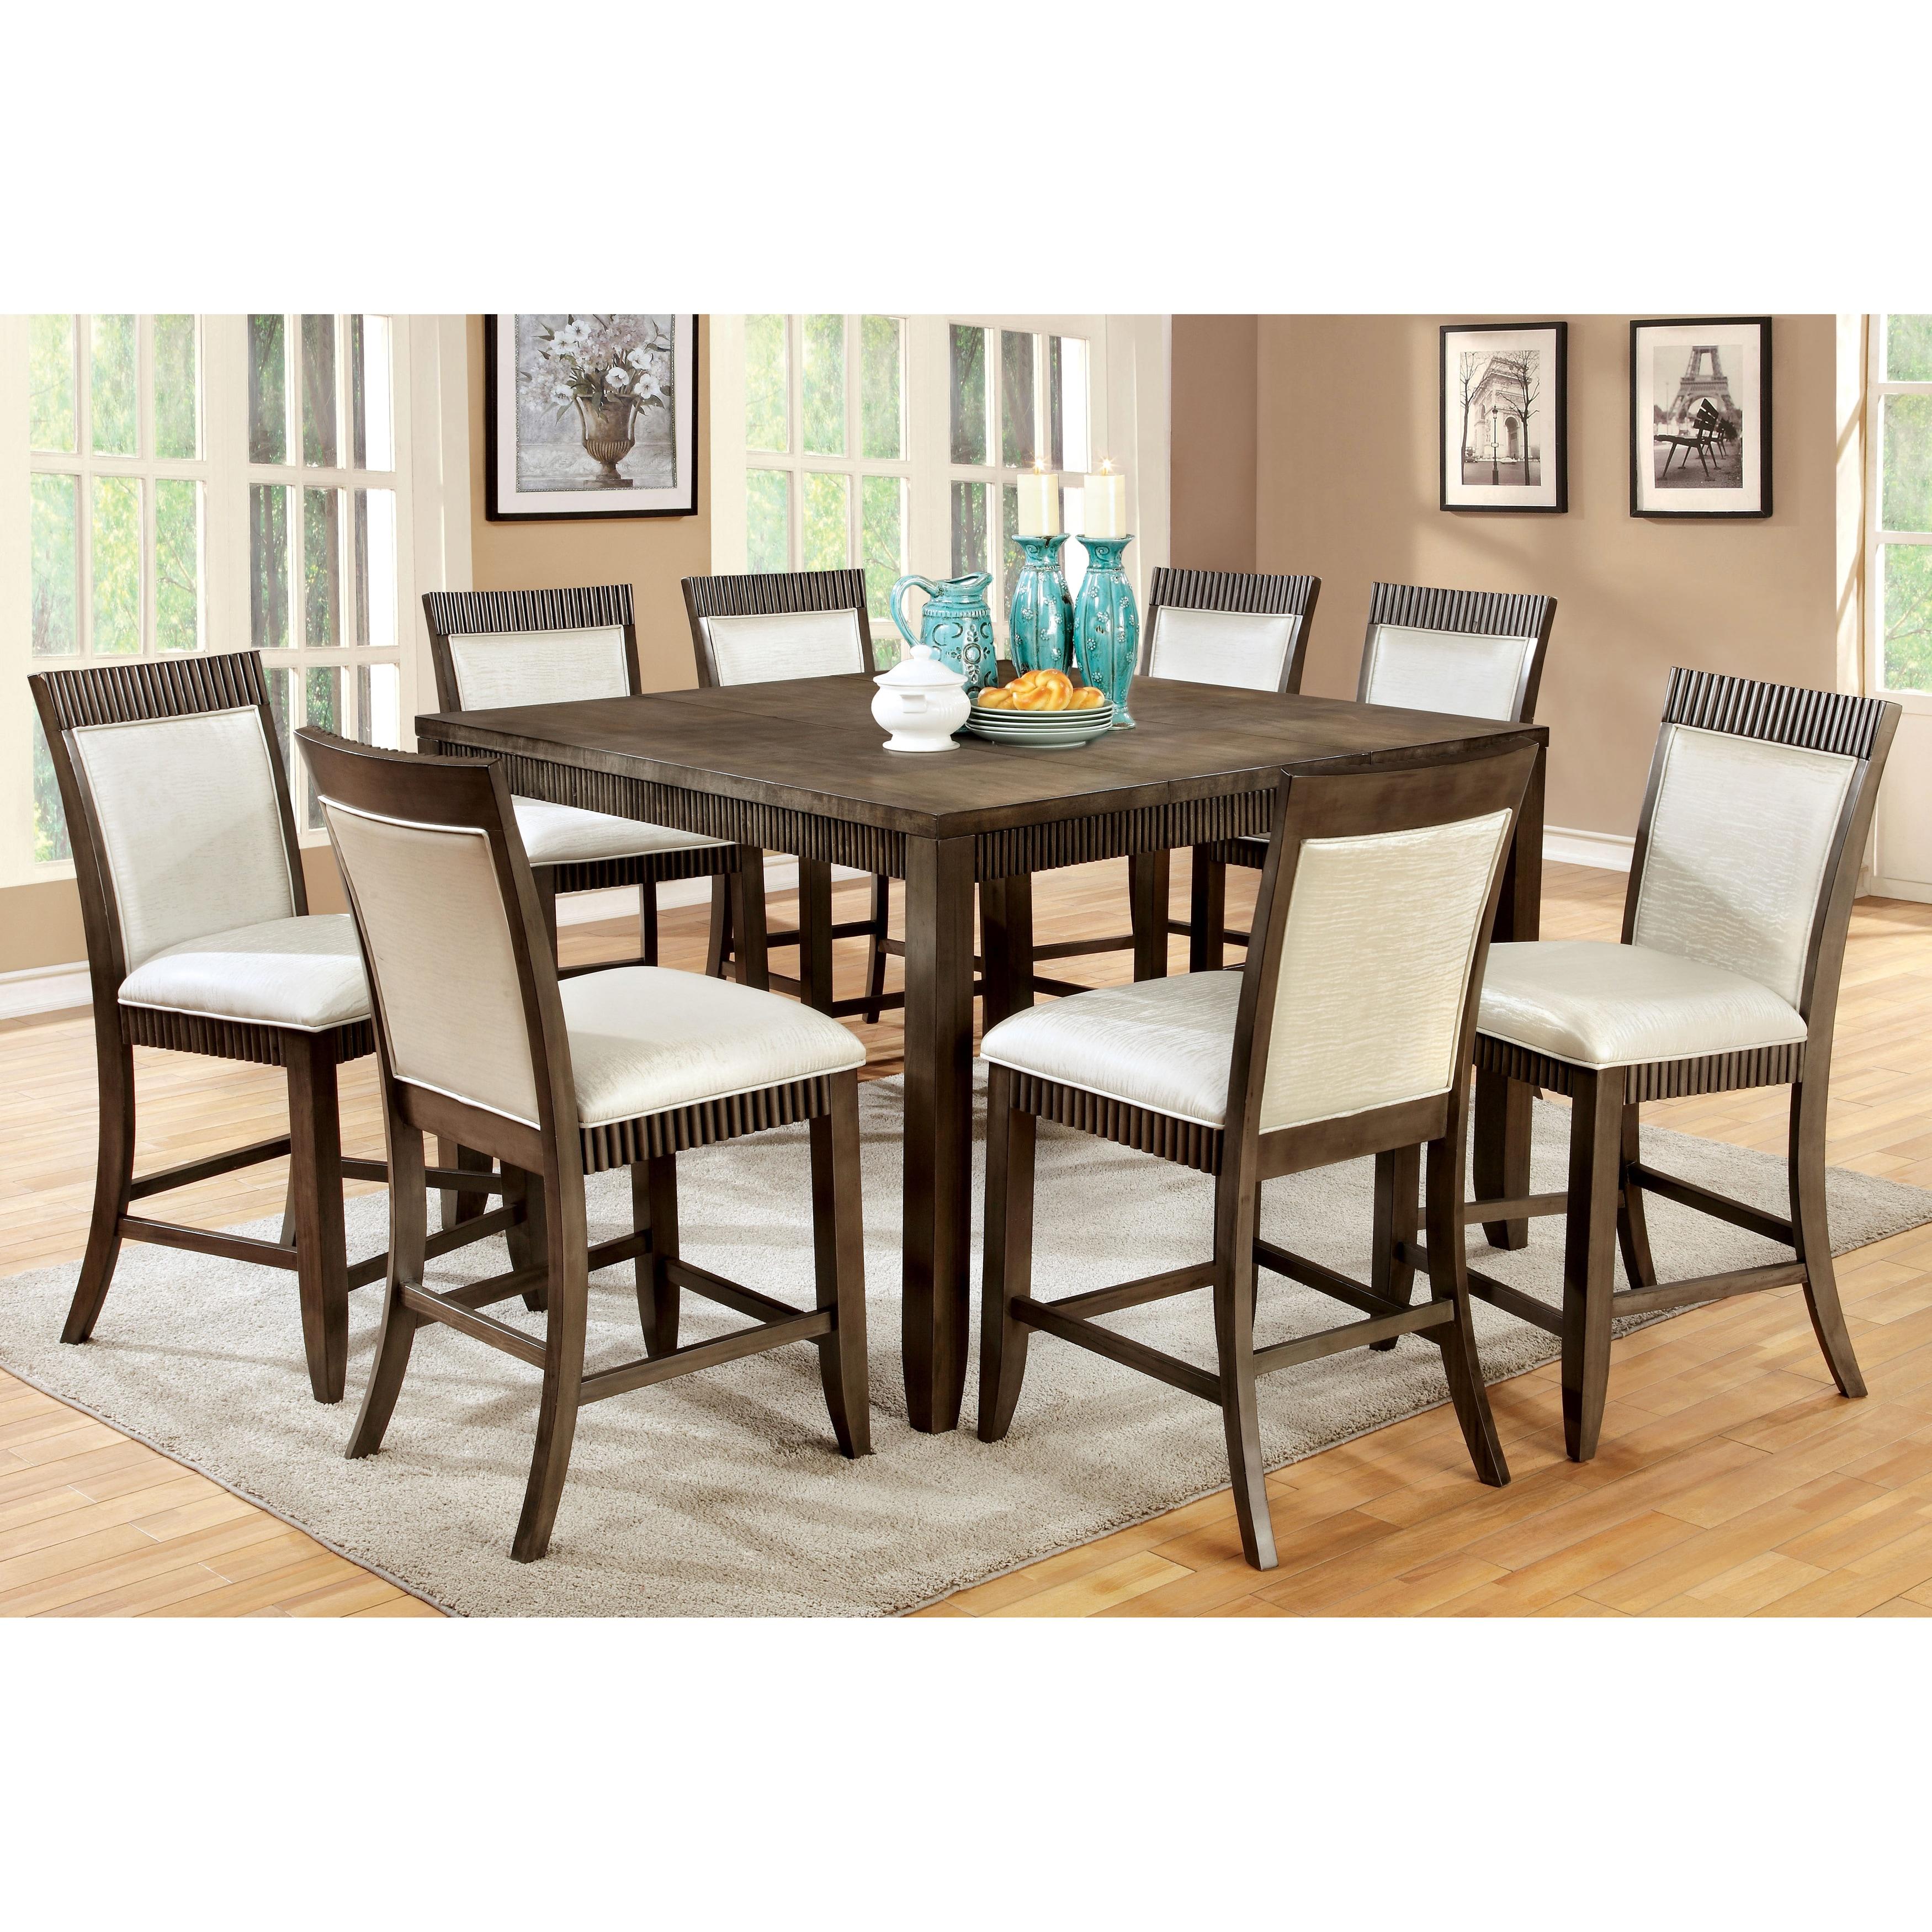 Furniture of America Mariselle 9-Piece Urban Grey Counter...